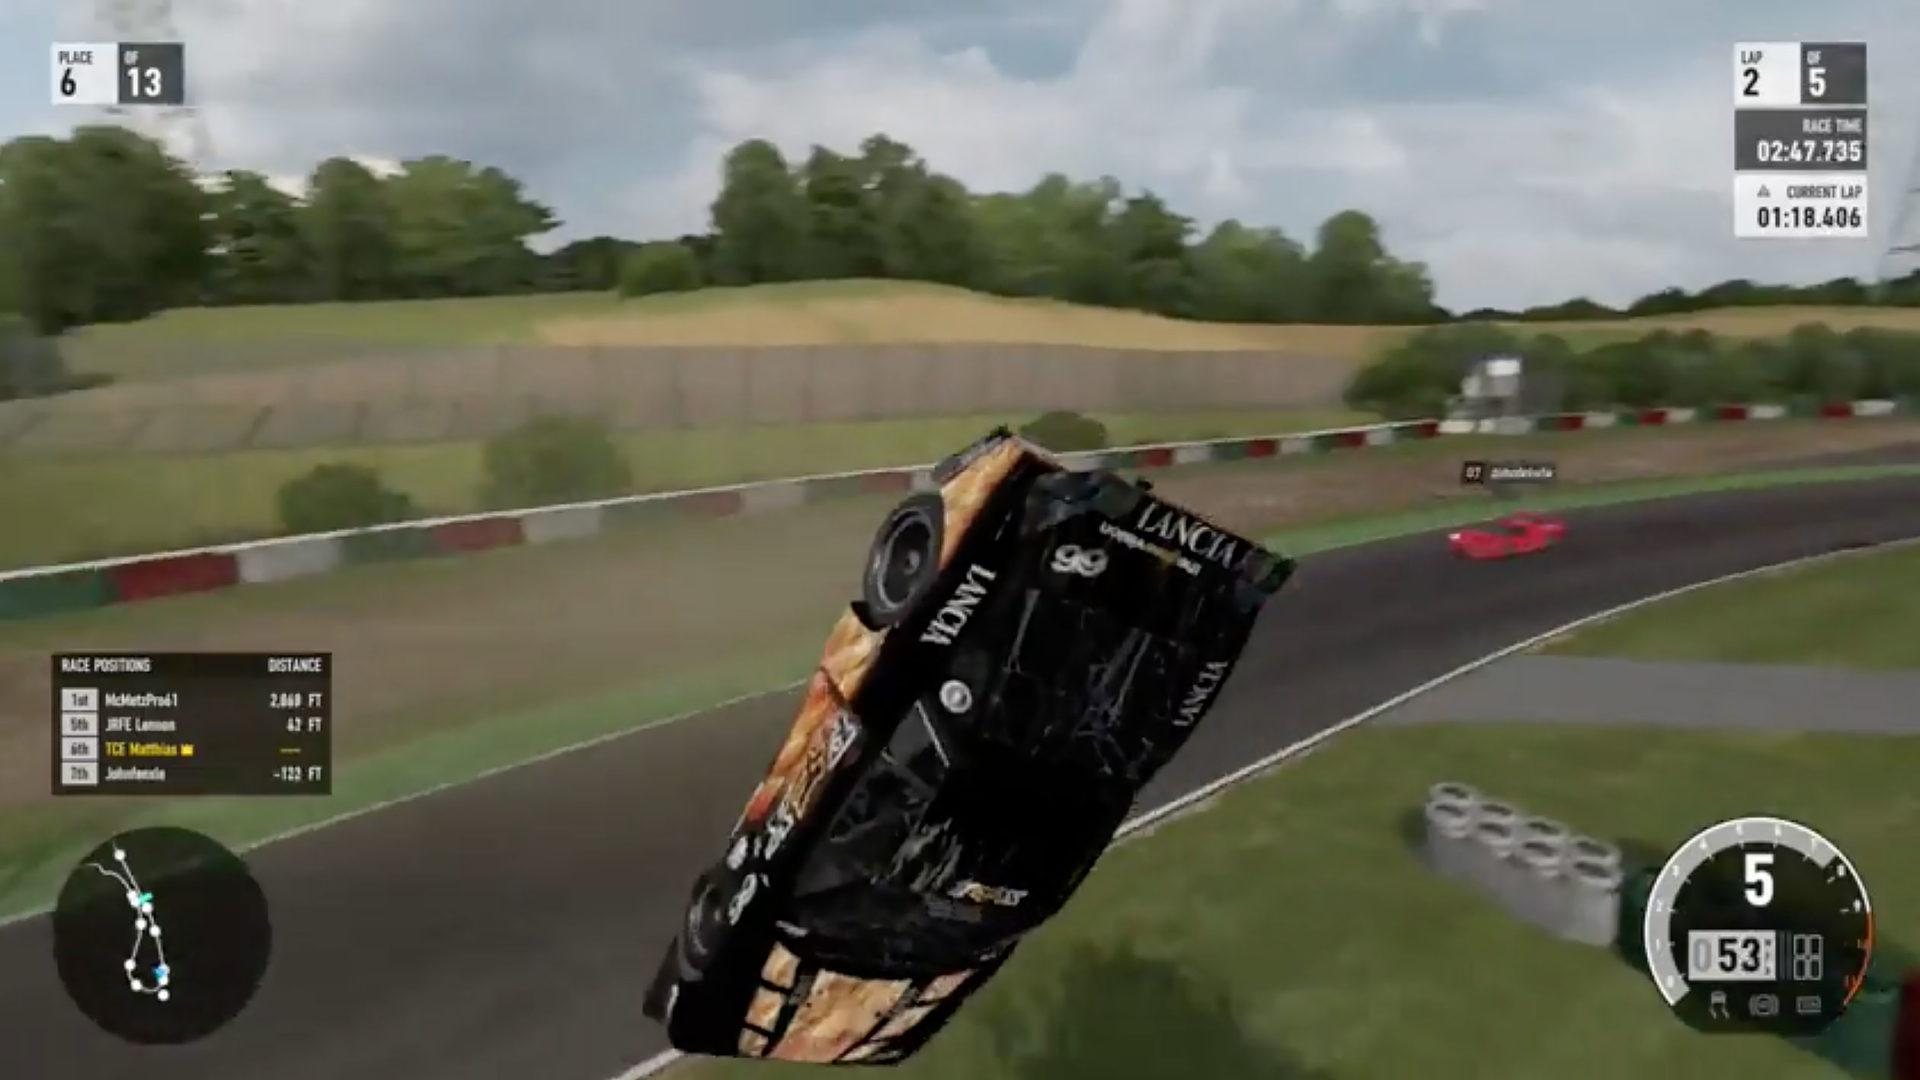 Forza Motorsport space glitch